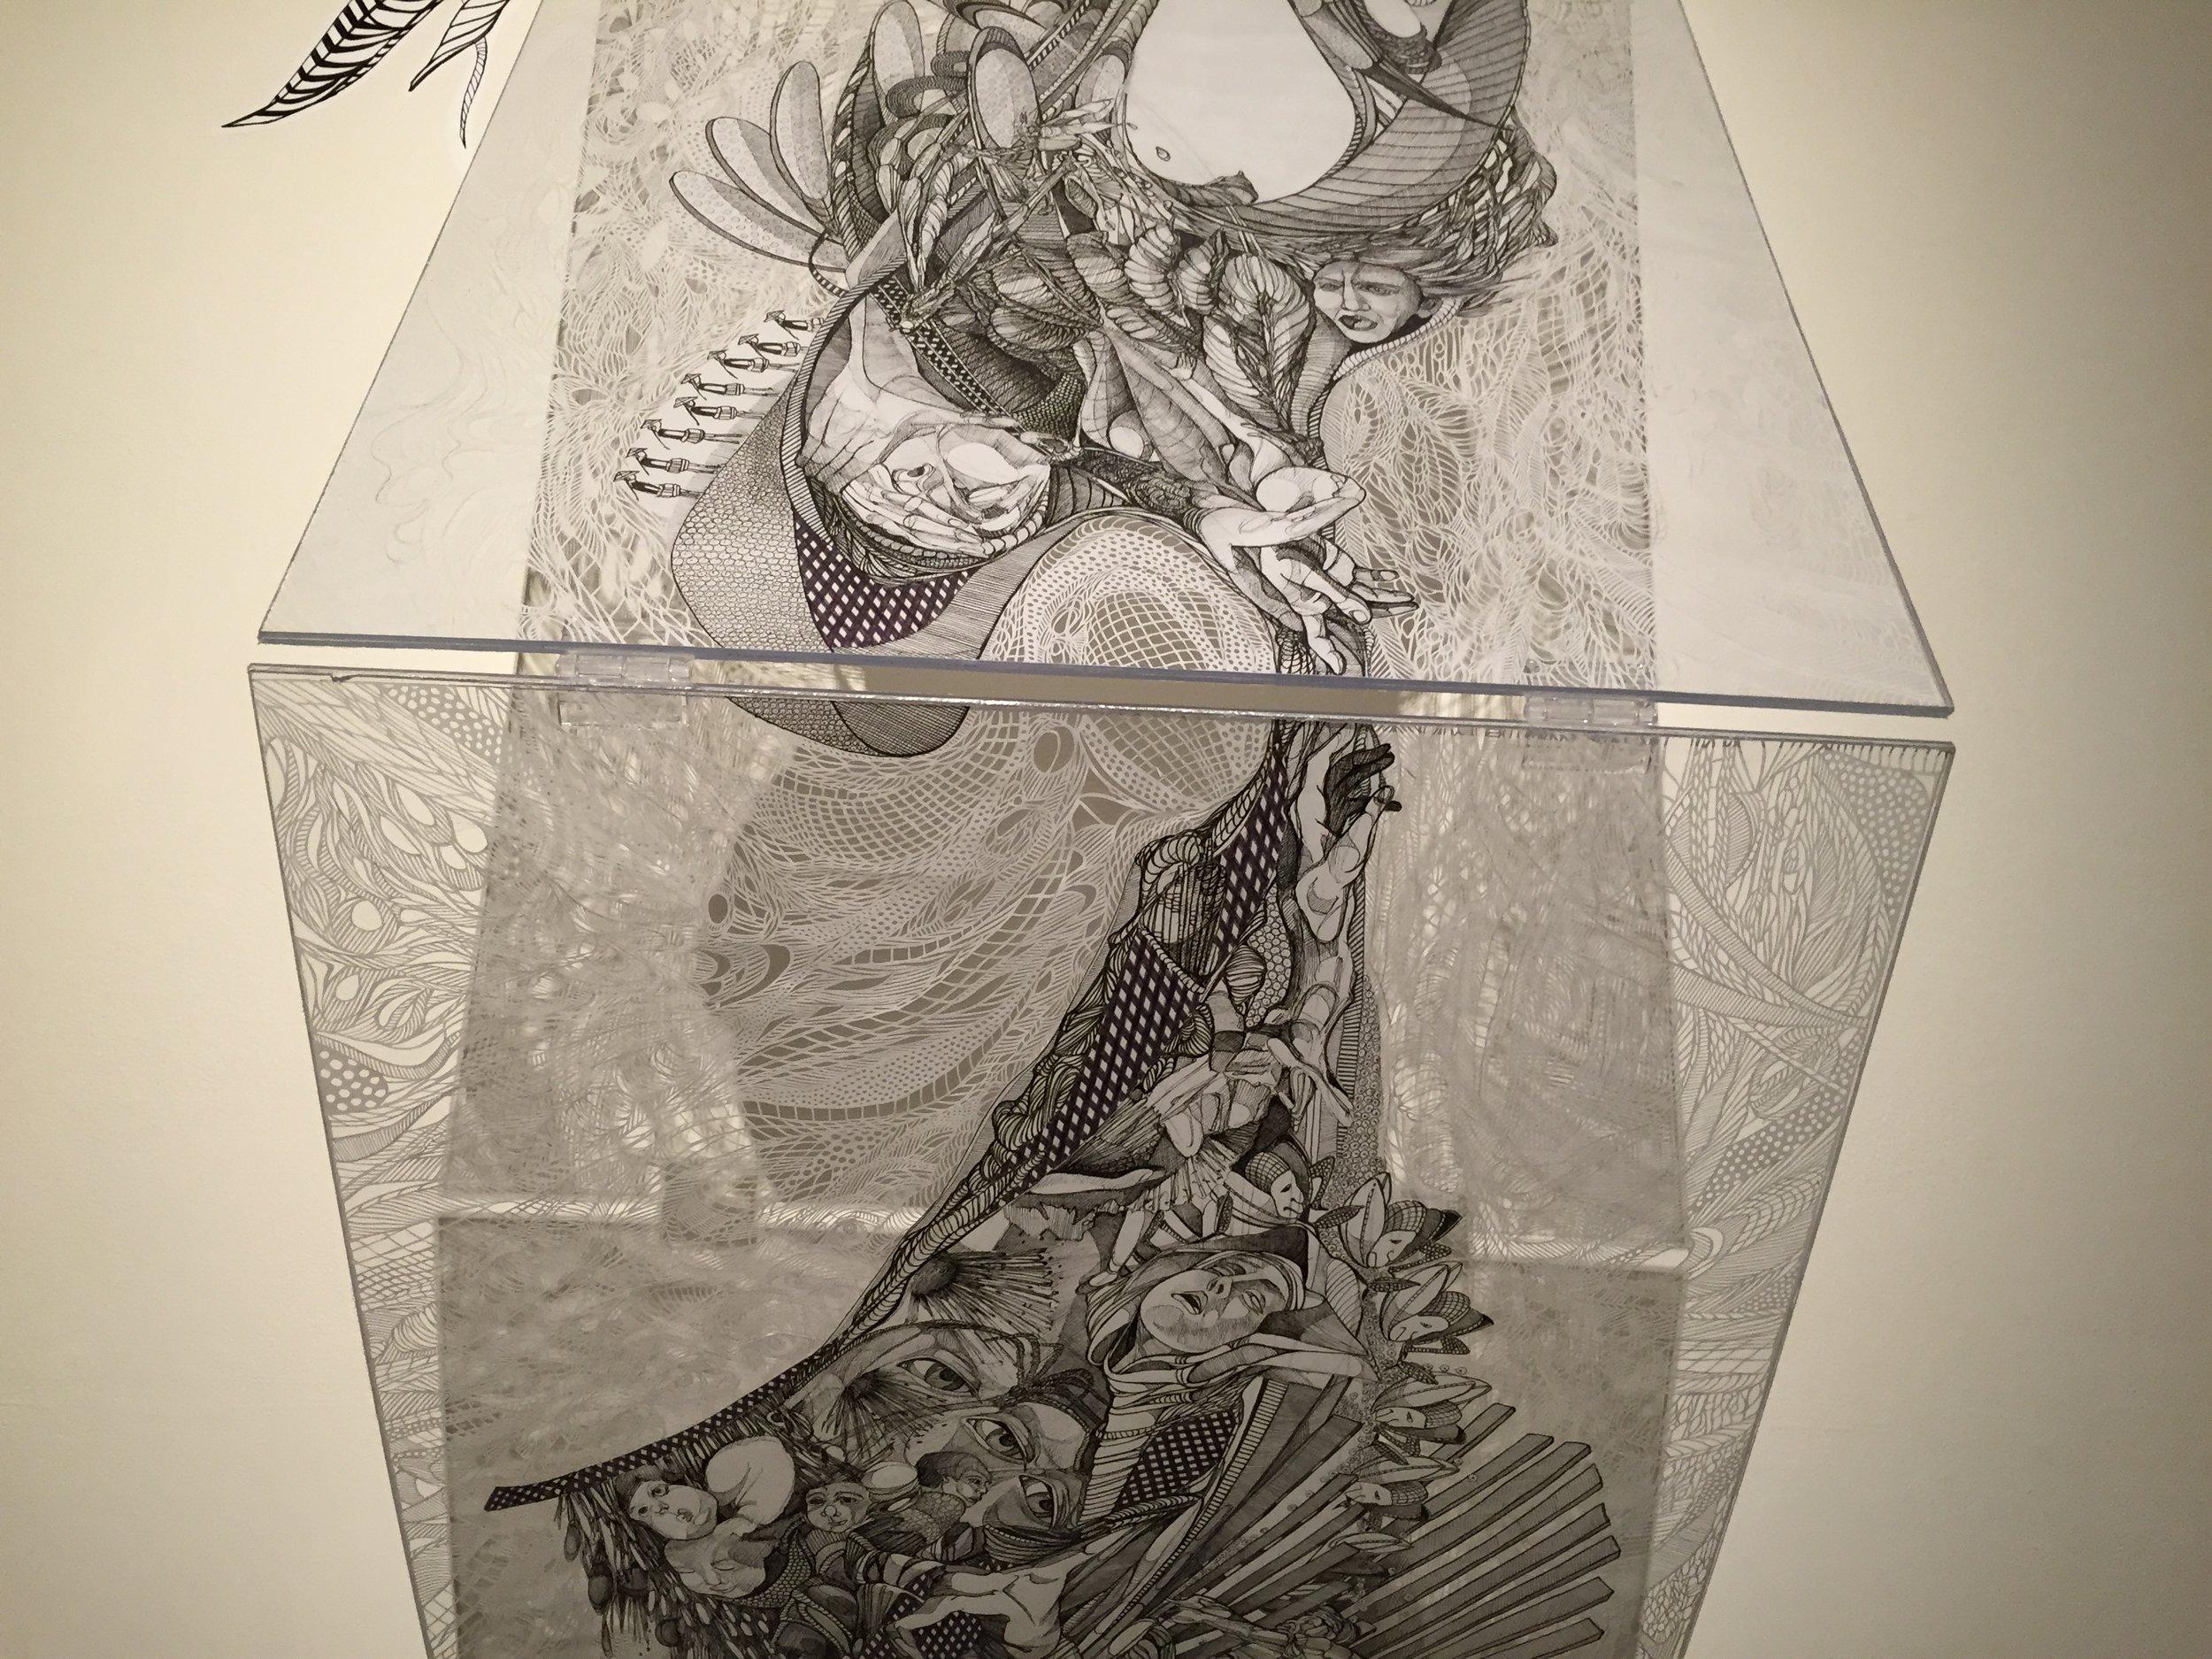 Whistler_Deb detail 1.jpg